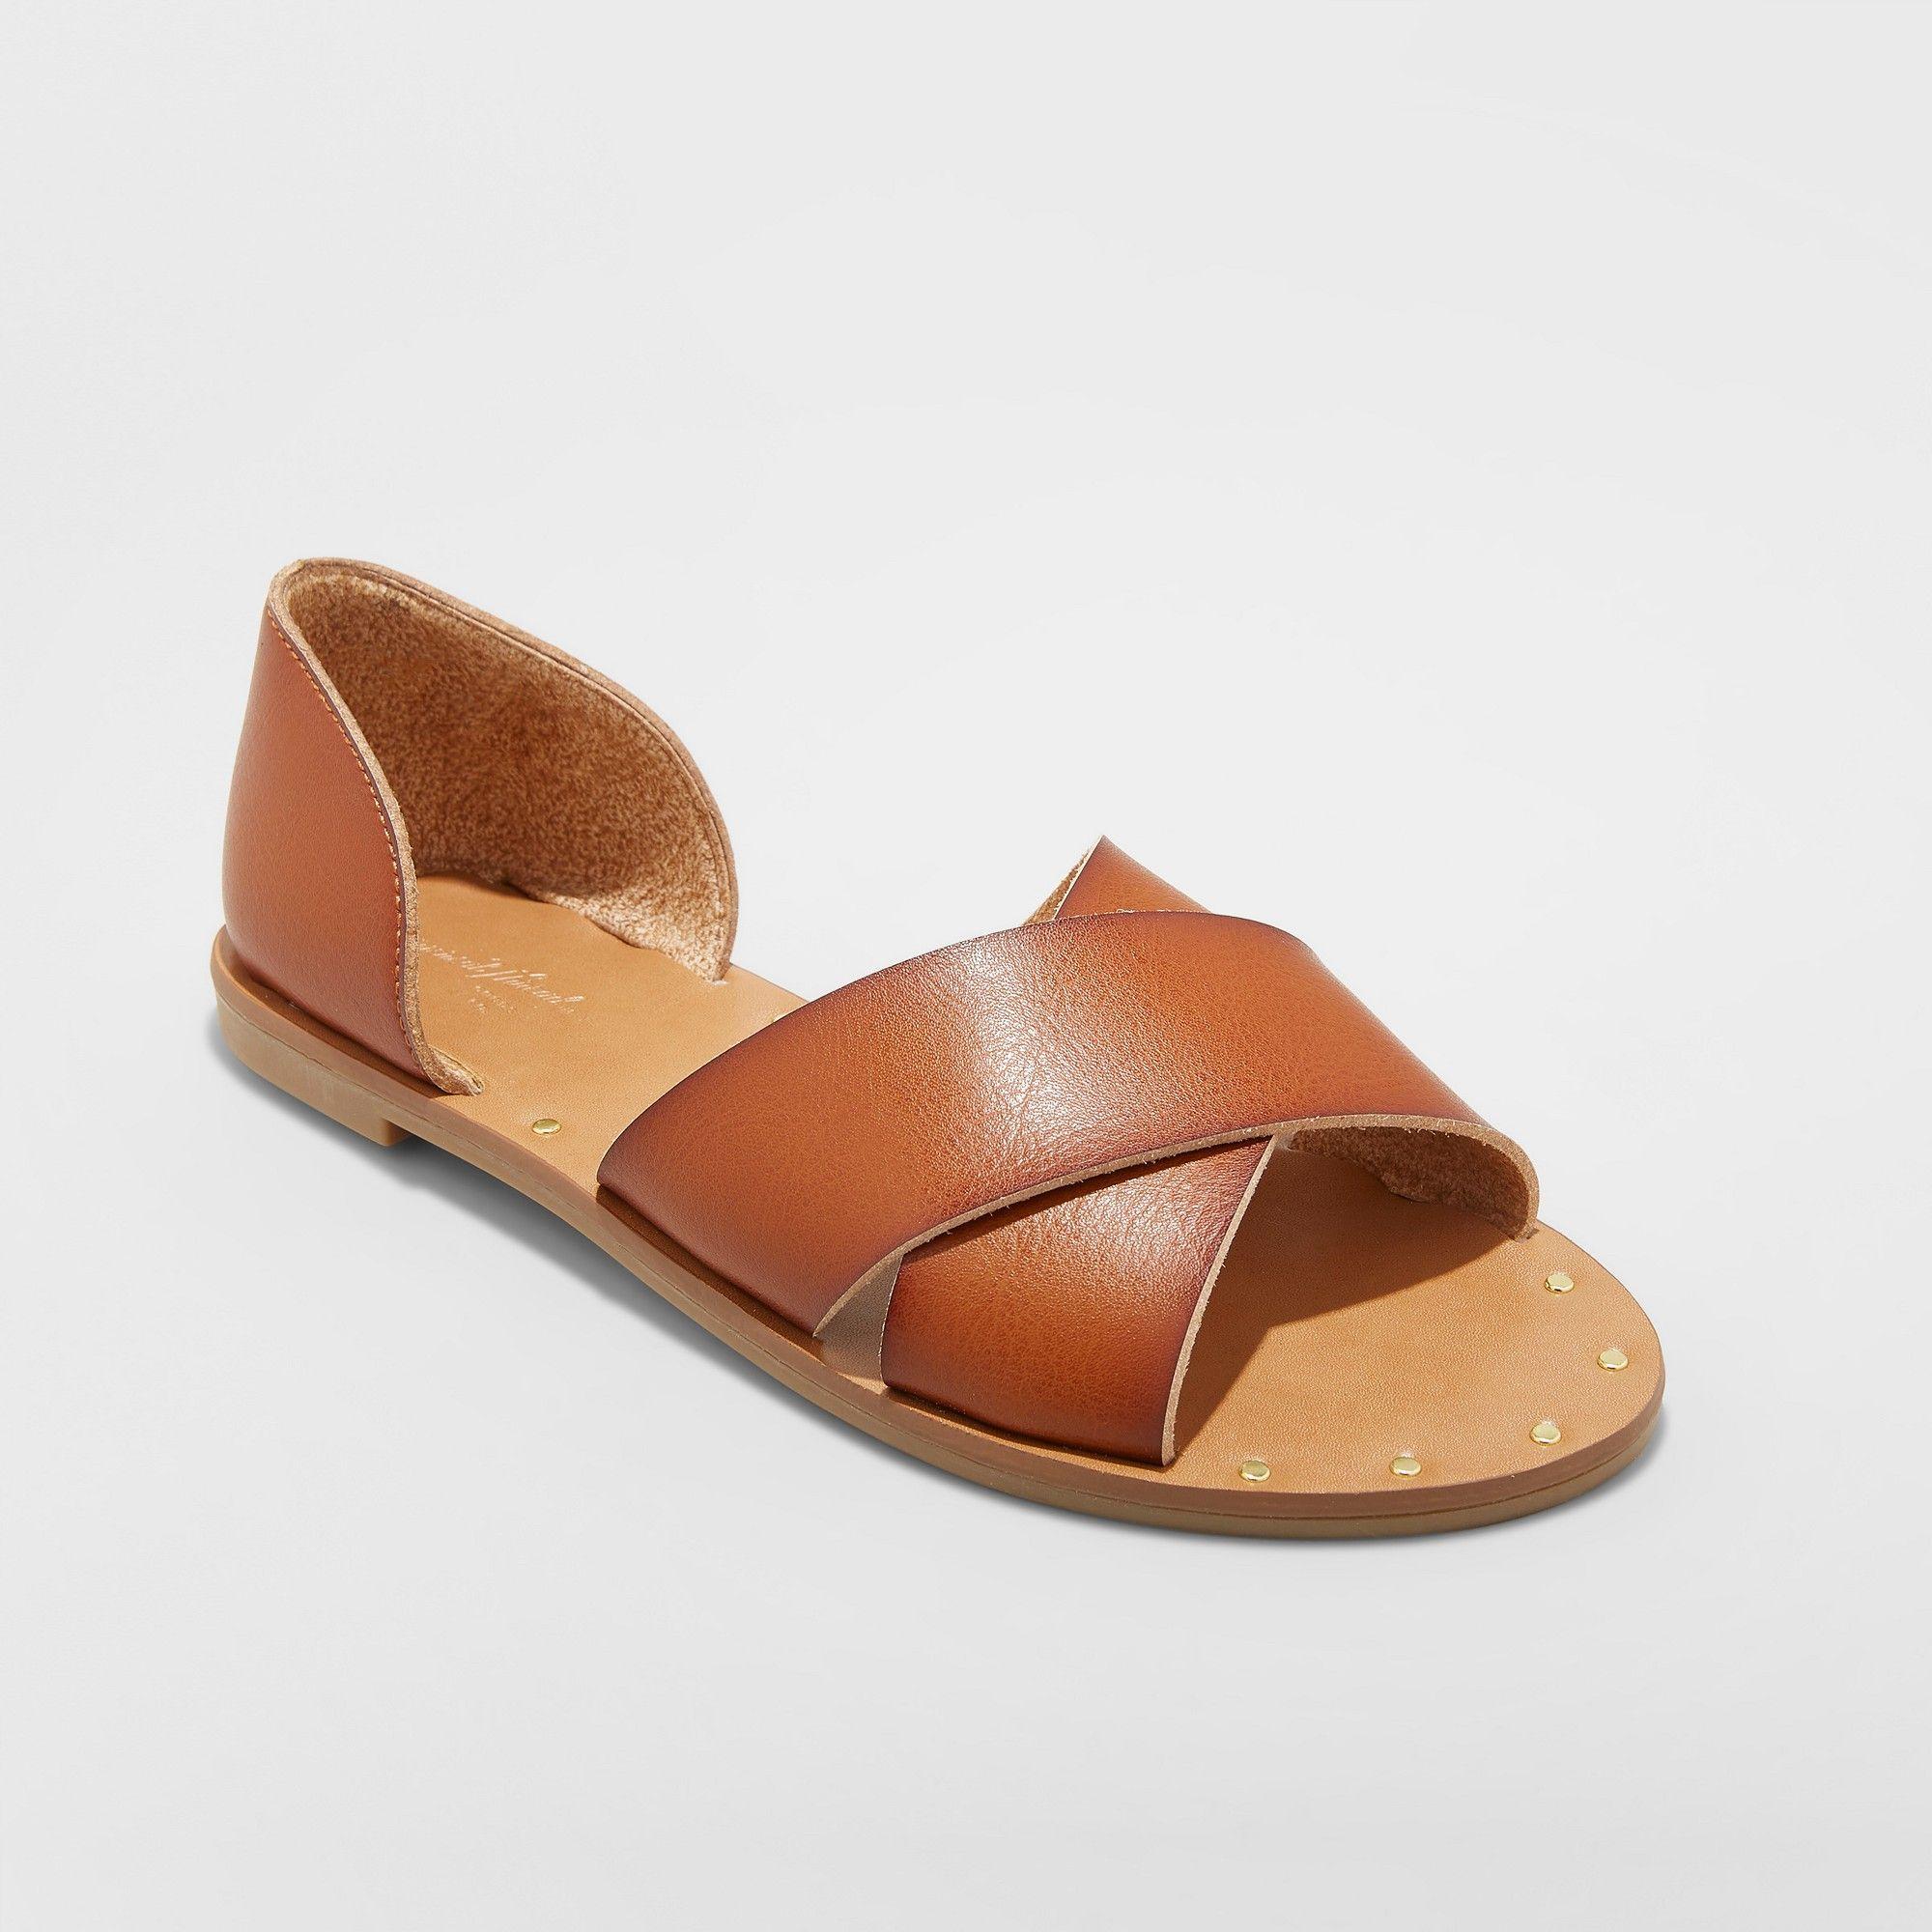 f13d8fd4117 Women s Lois Wide Width Crossband Sandals - Universal Thread Cognac (Red)  8.5W